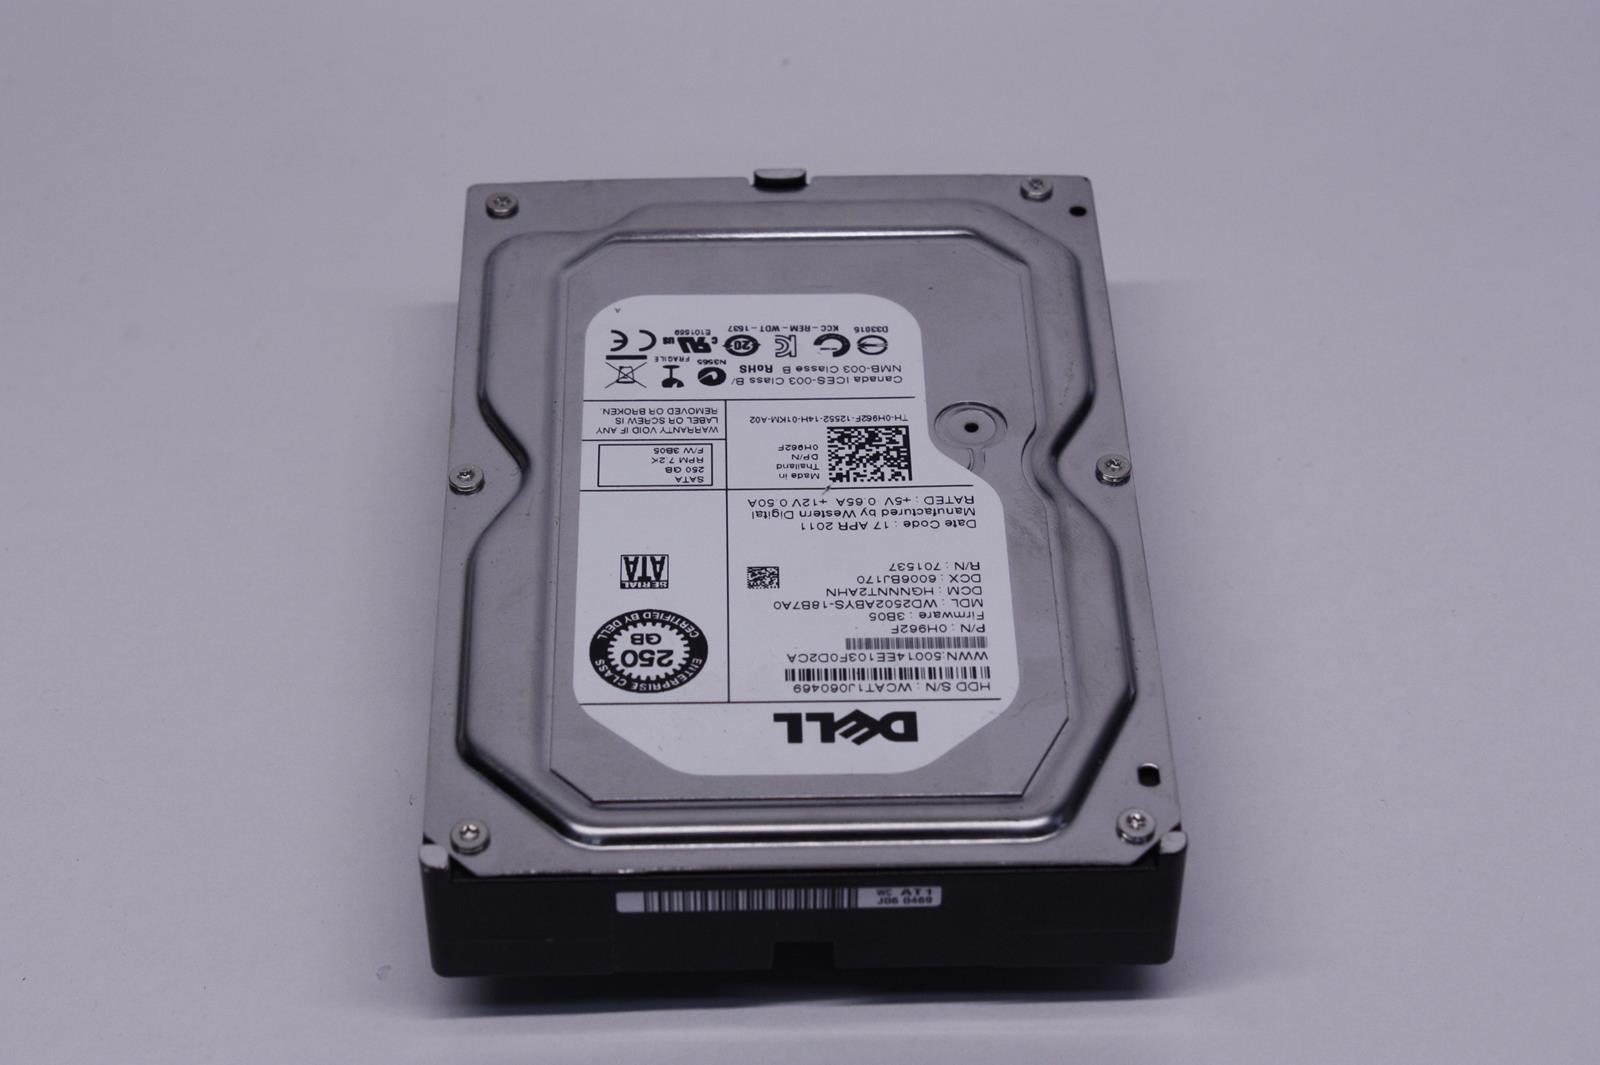 Dell Wd 250GB 7.2K RPM 3Gbp//s SATA 3.5 Inch Hard Drive H962f Wd2502abys-18b7a0